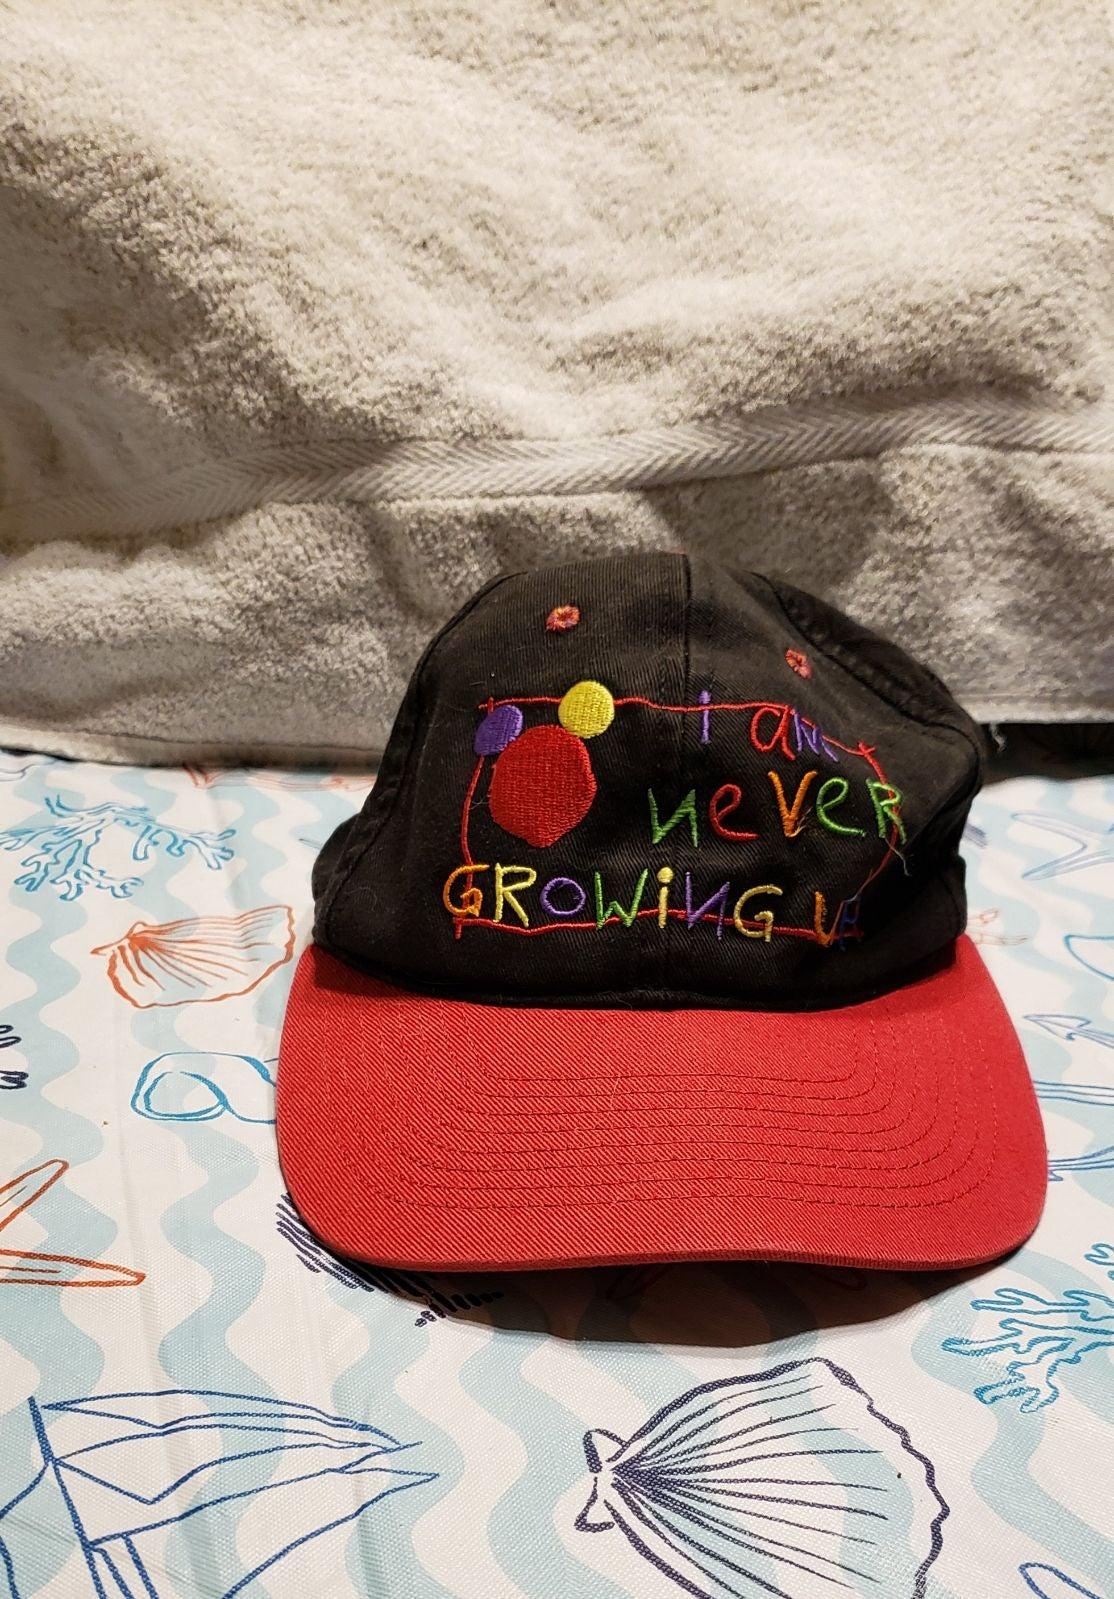 Vintage disney baseball hat